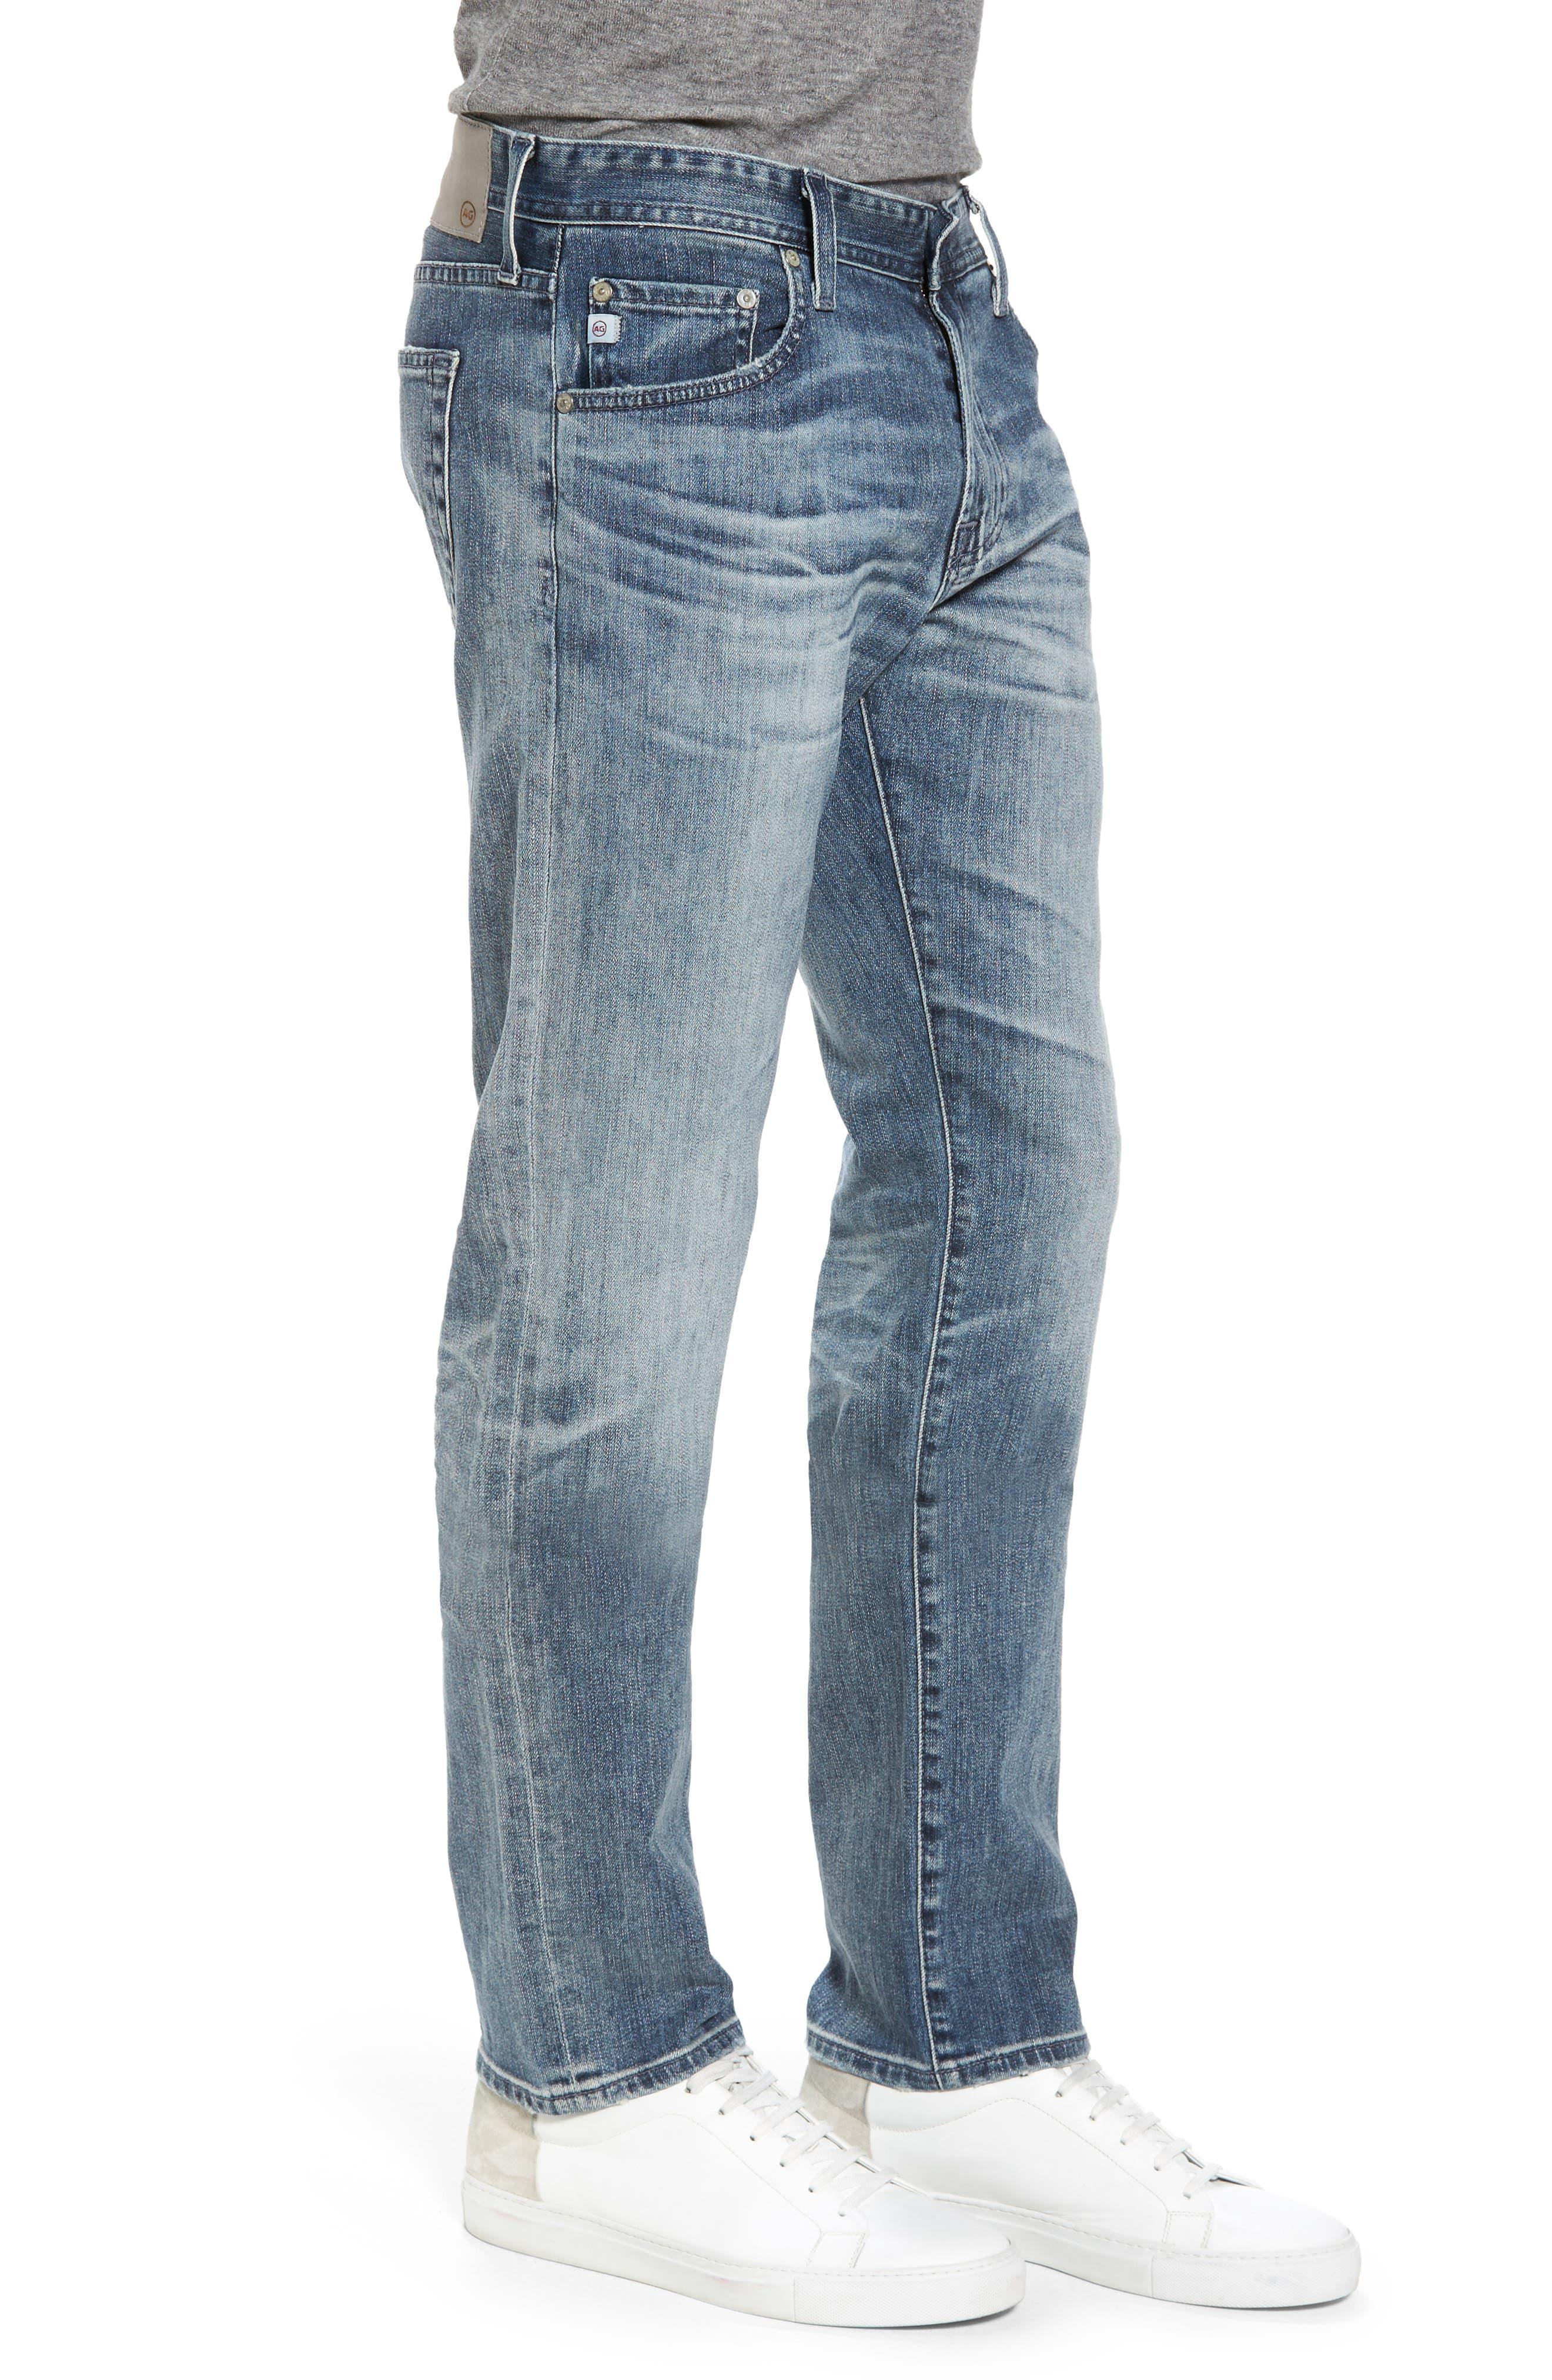 Tellis Slim Fit Jeans,                             Alternate thumbnail 3, color,                             487